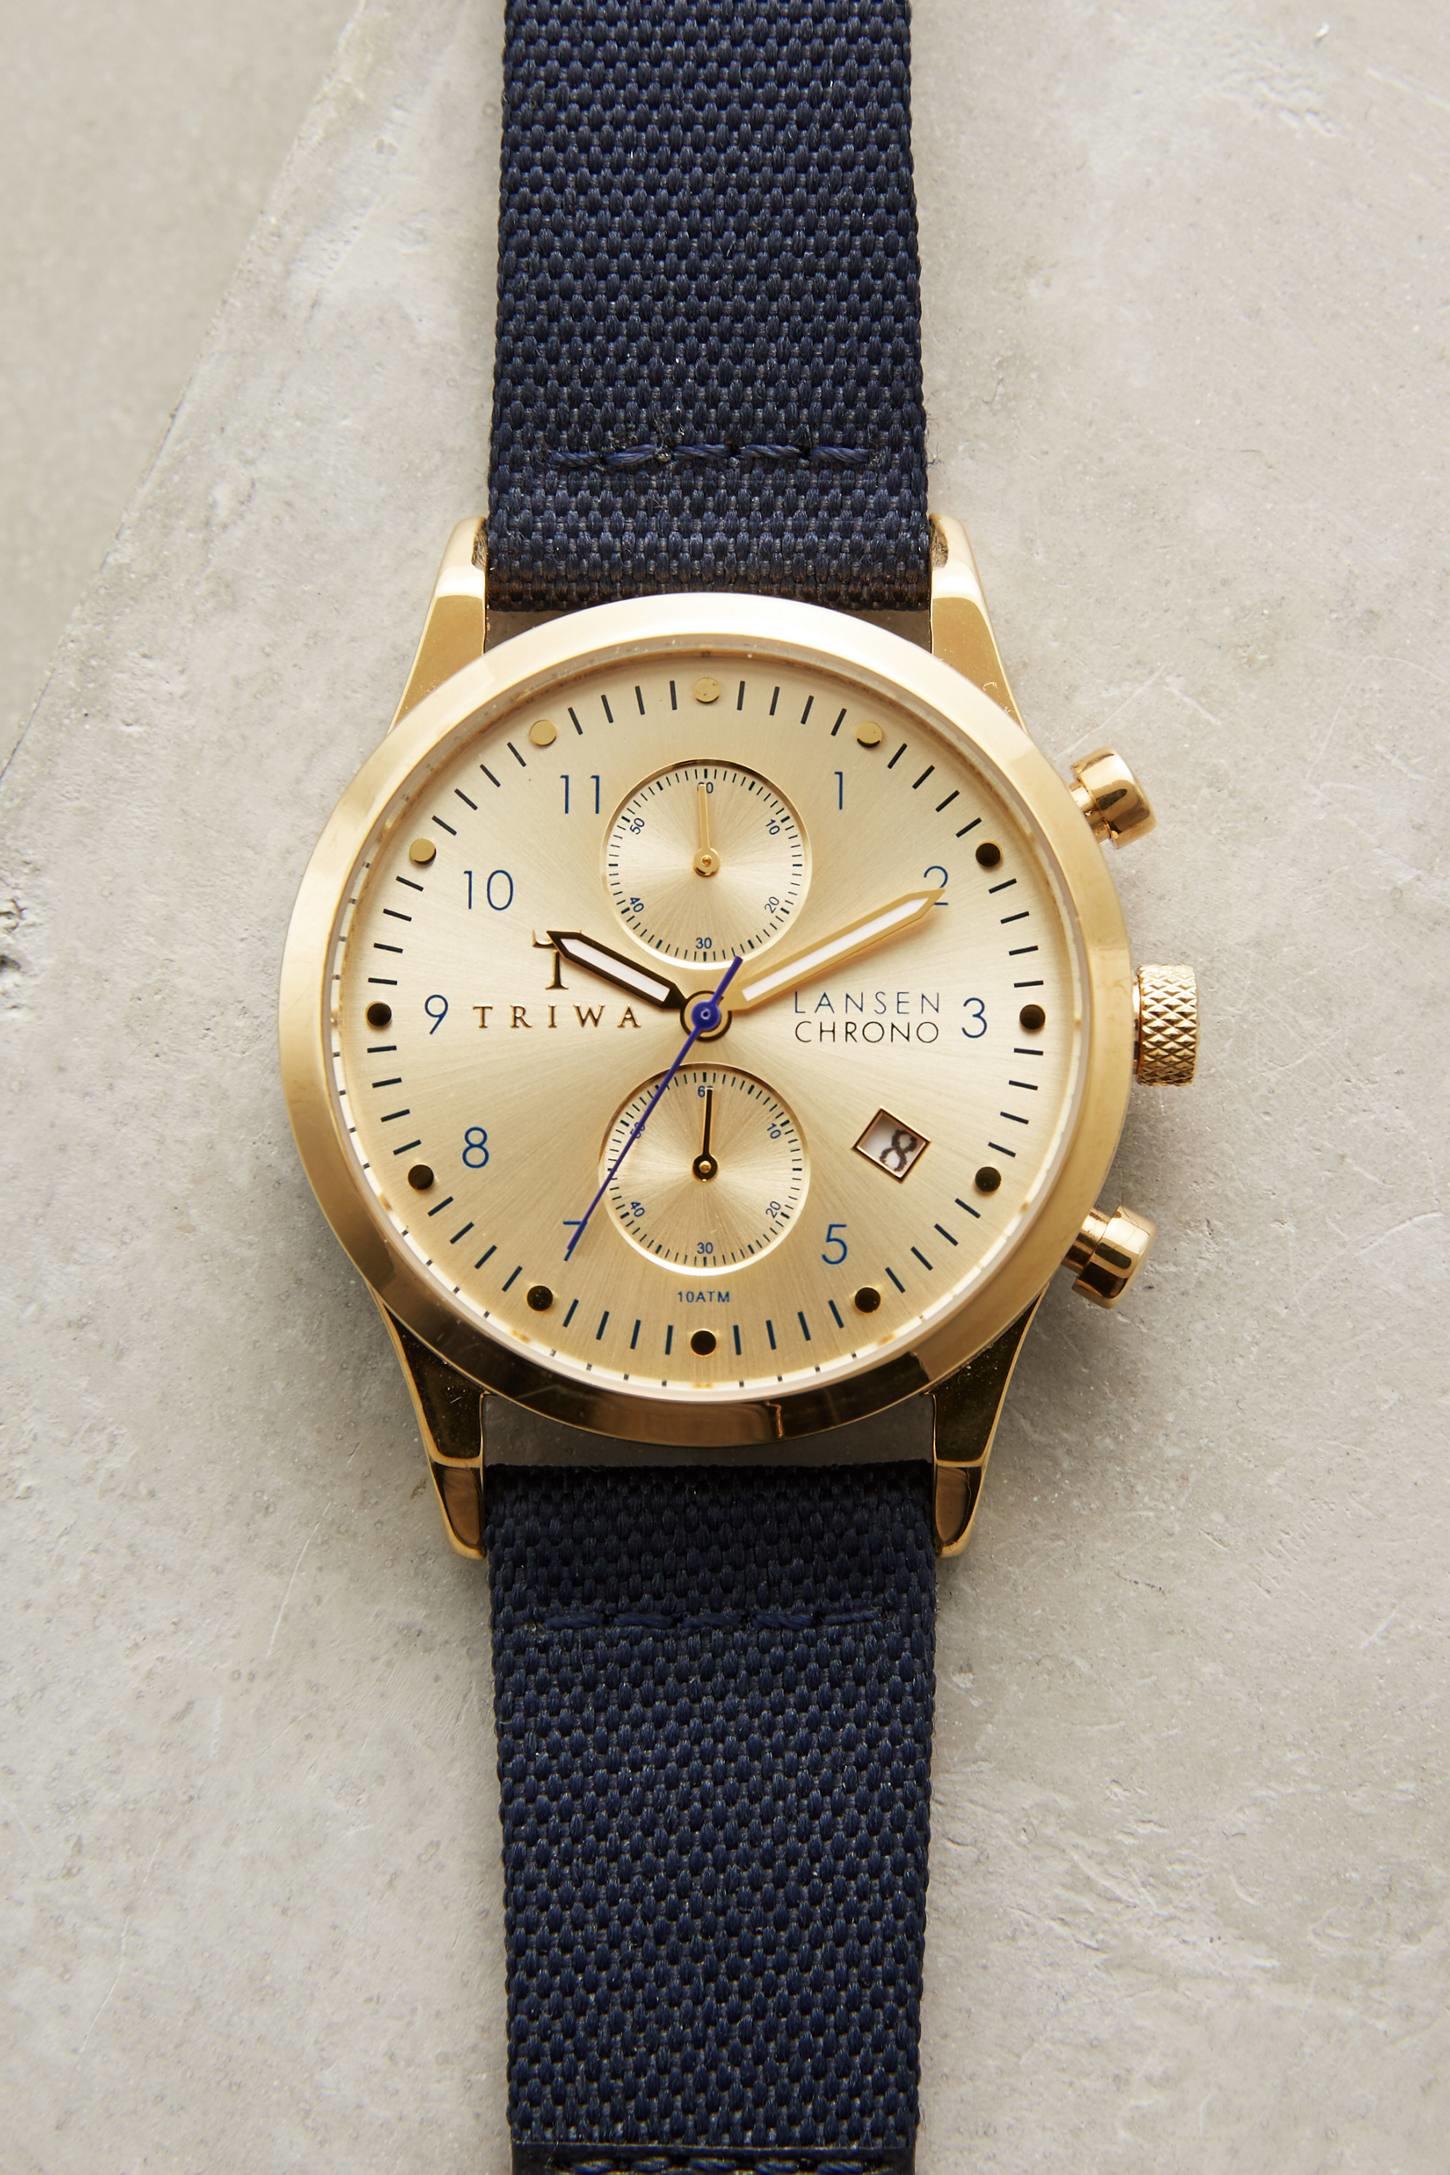 Triwa Lansen Chrono Watch in Blue